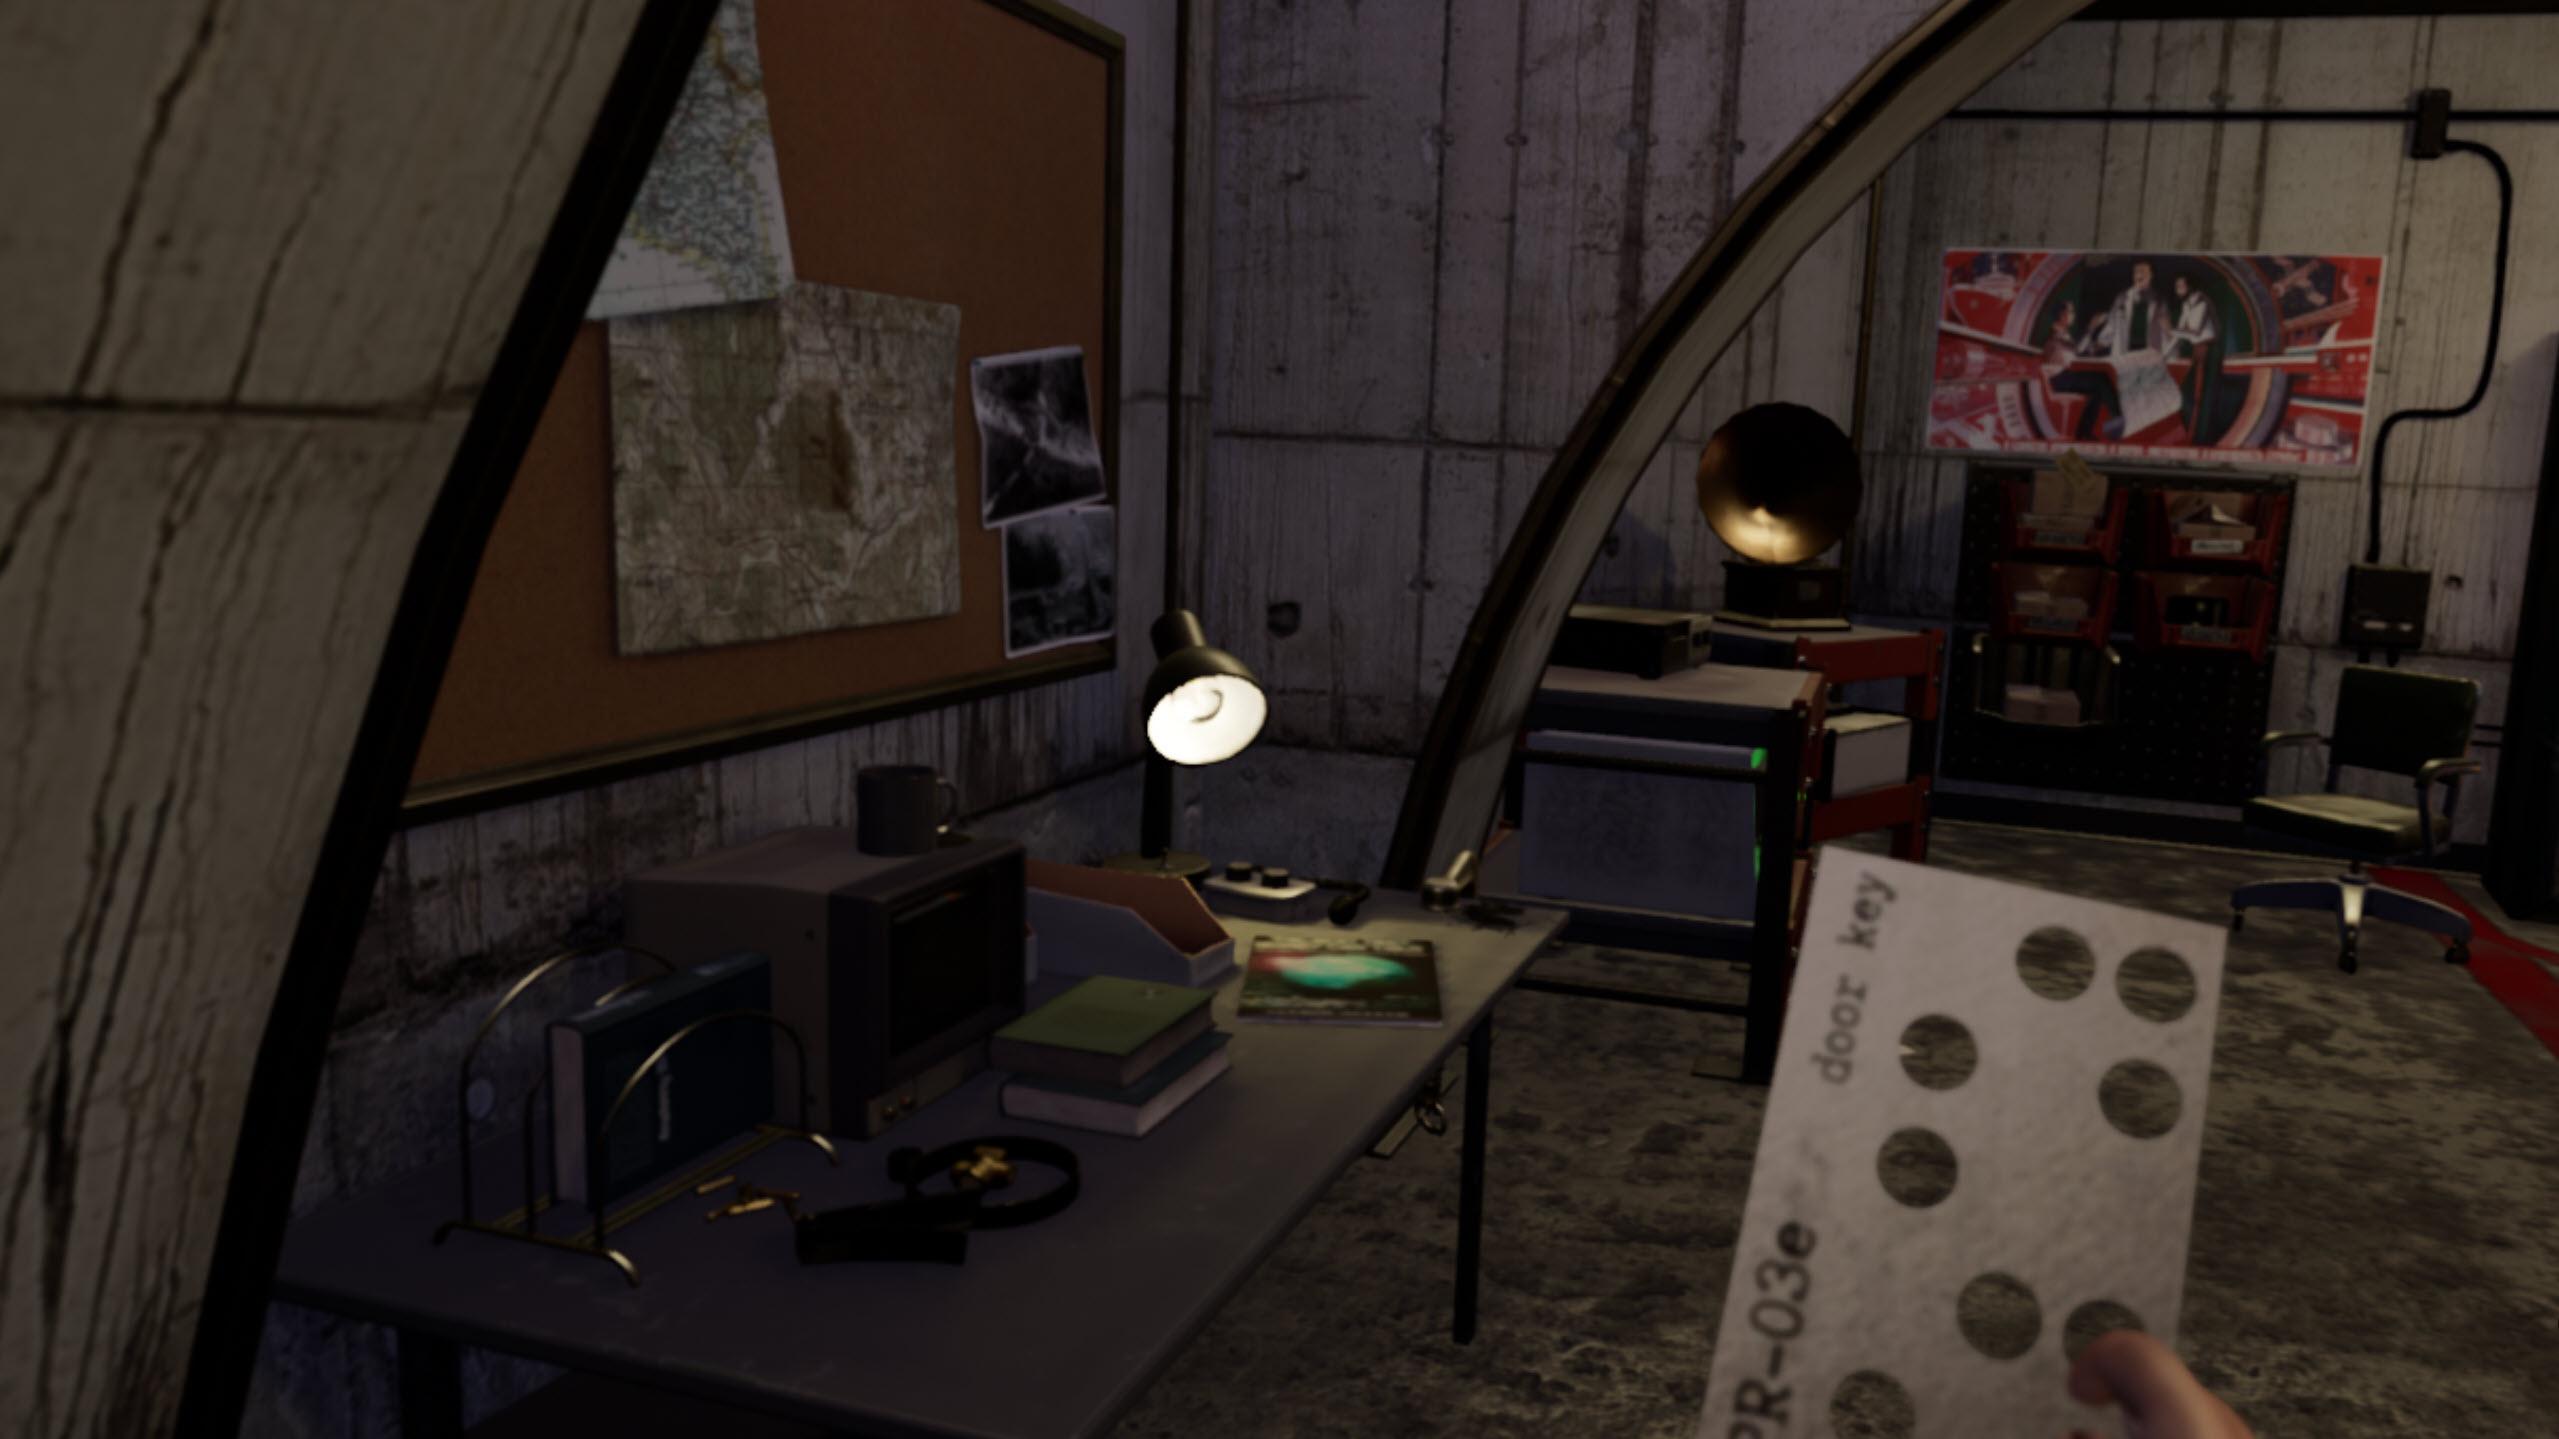 PROZE-Prolog-Oculus-Rift-HTC-Vive-Steam